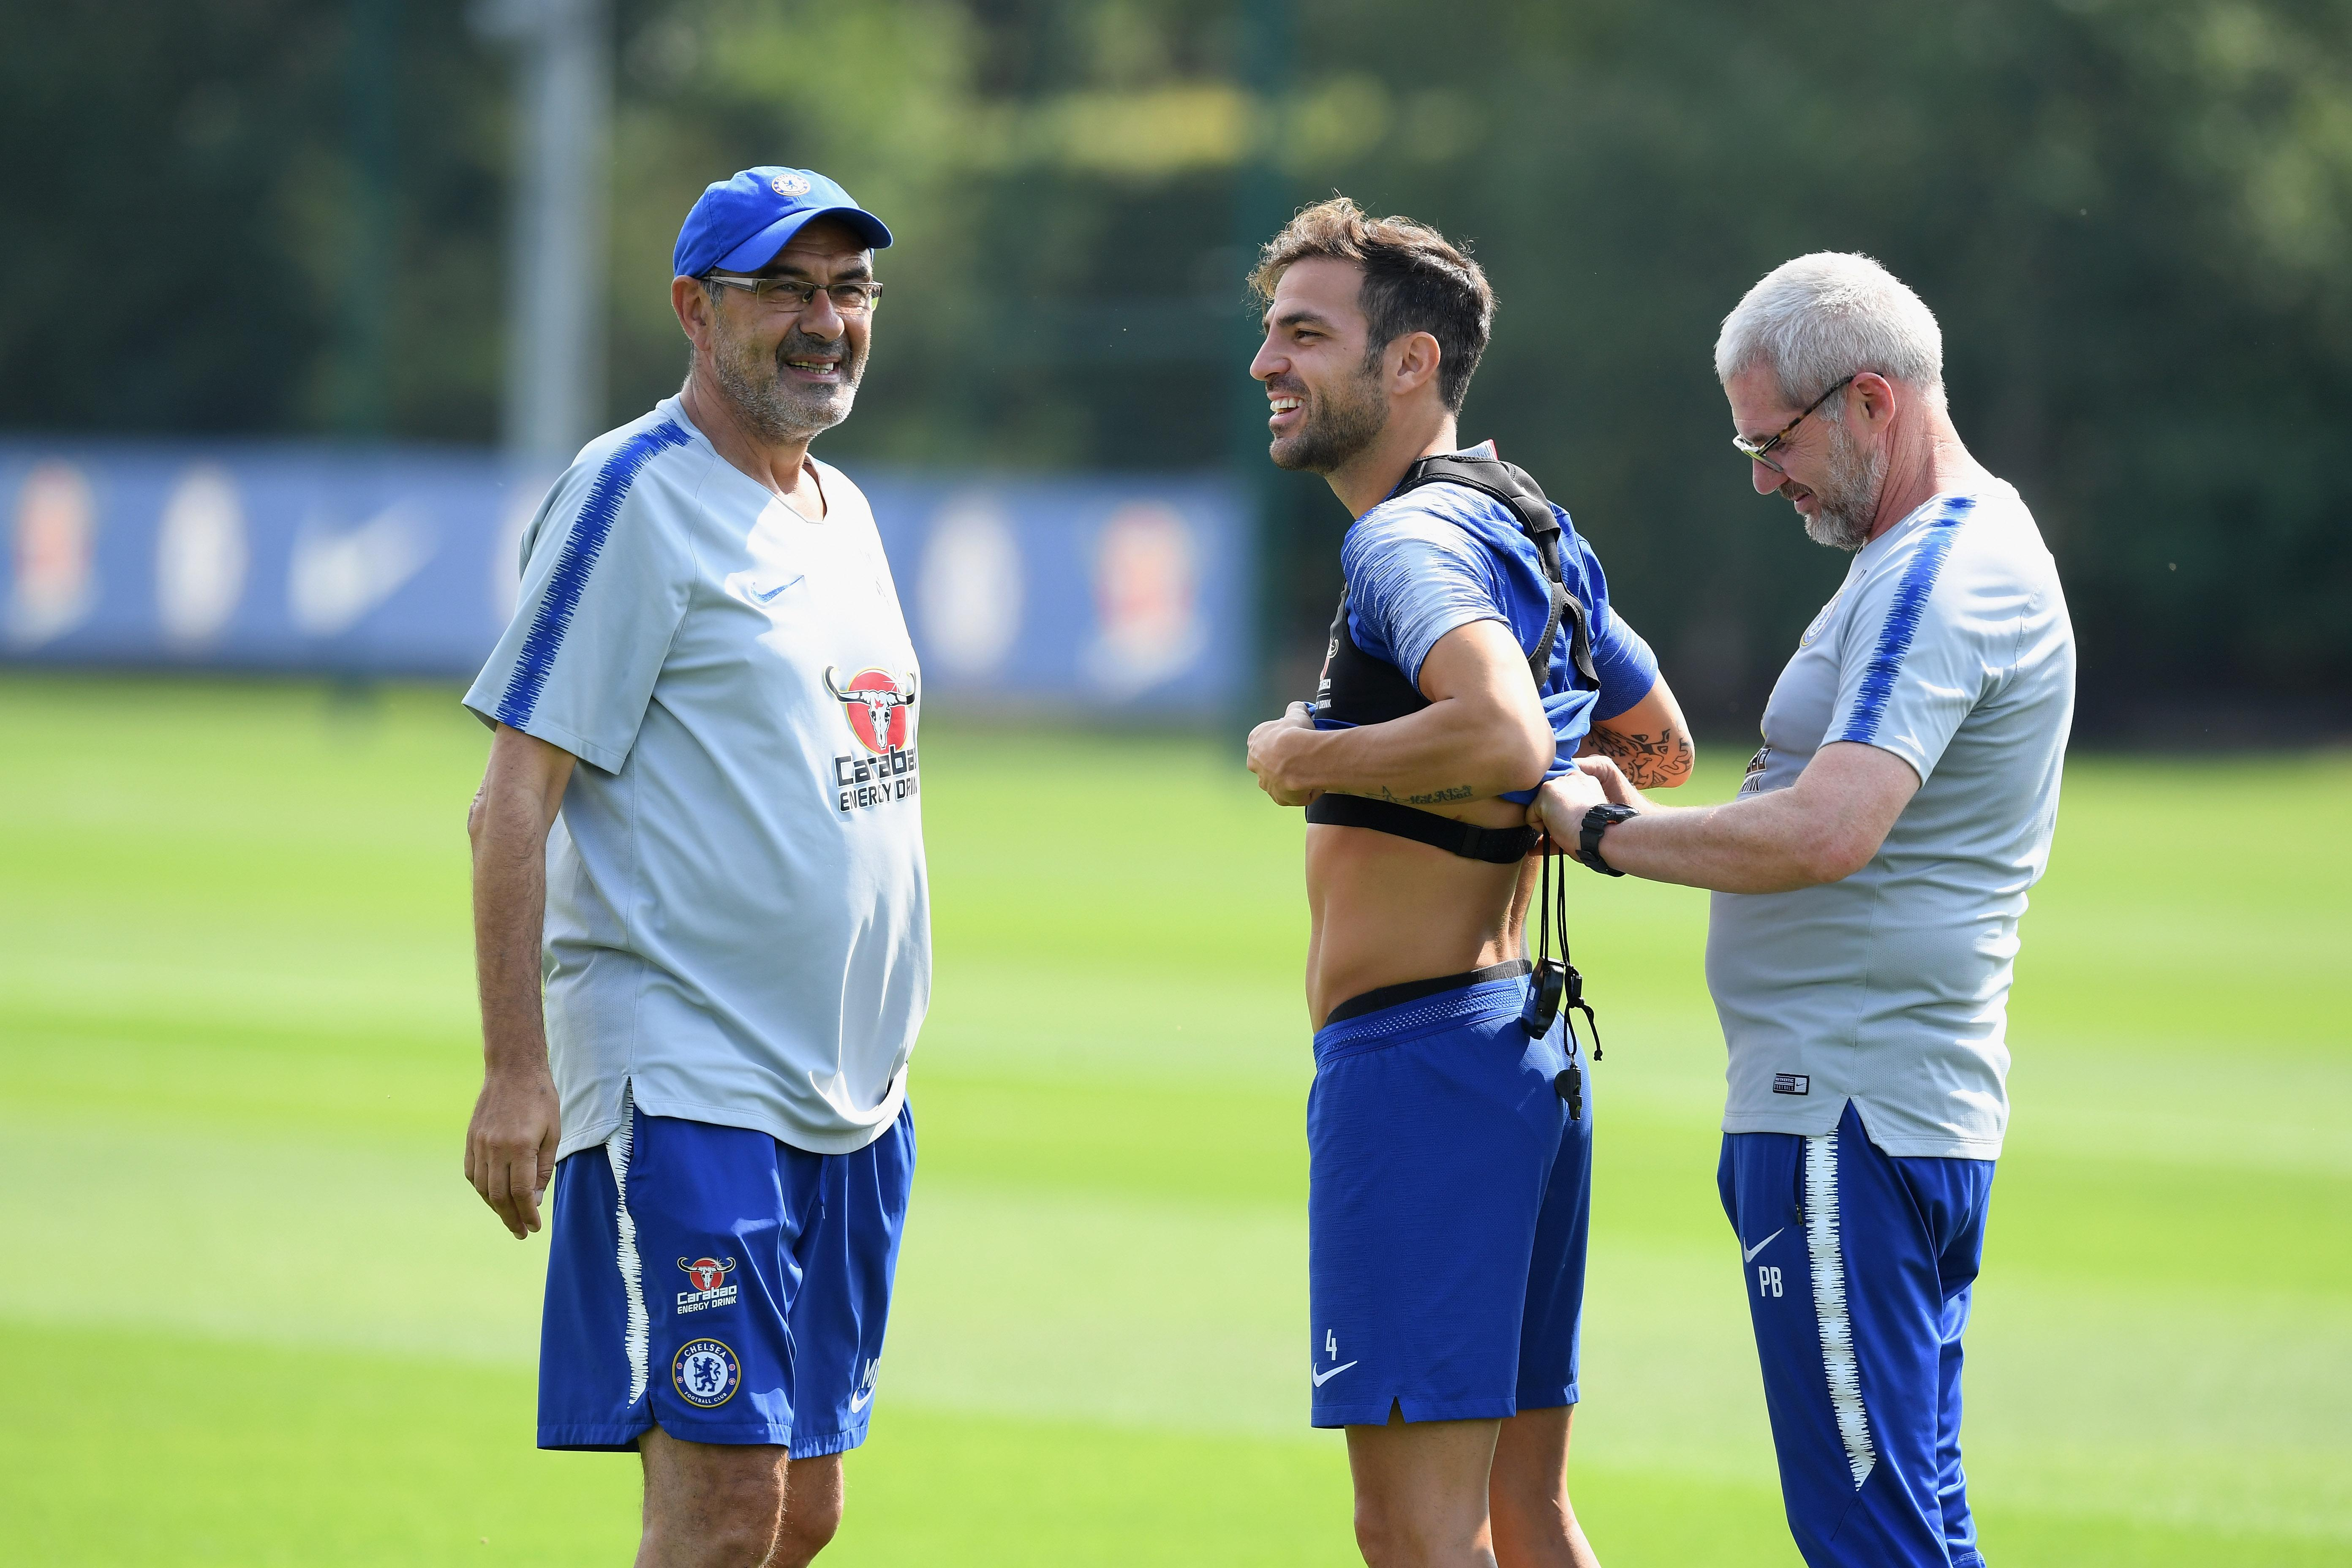 The midfielder has not played under new boss Maurizio Sarri because of injury